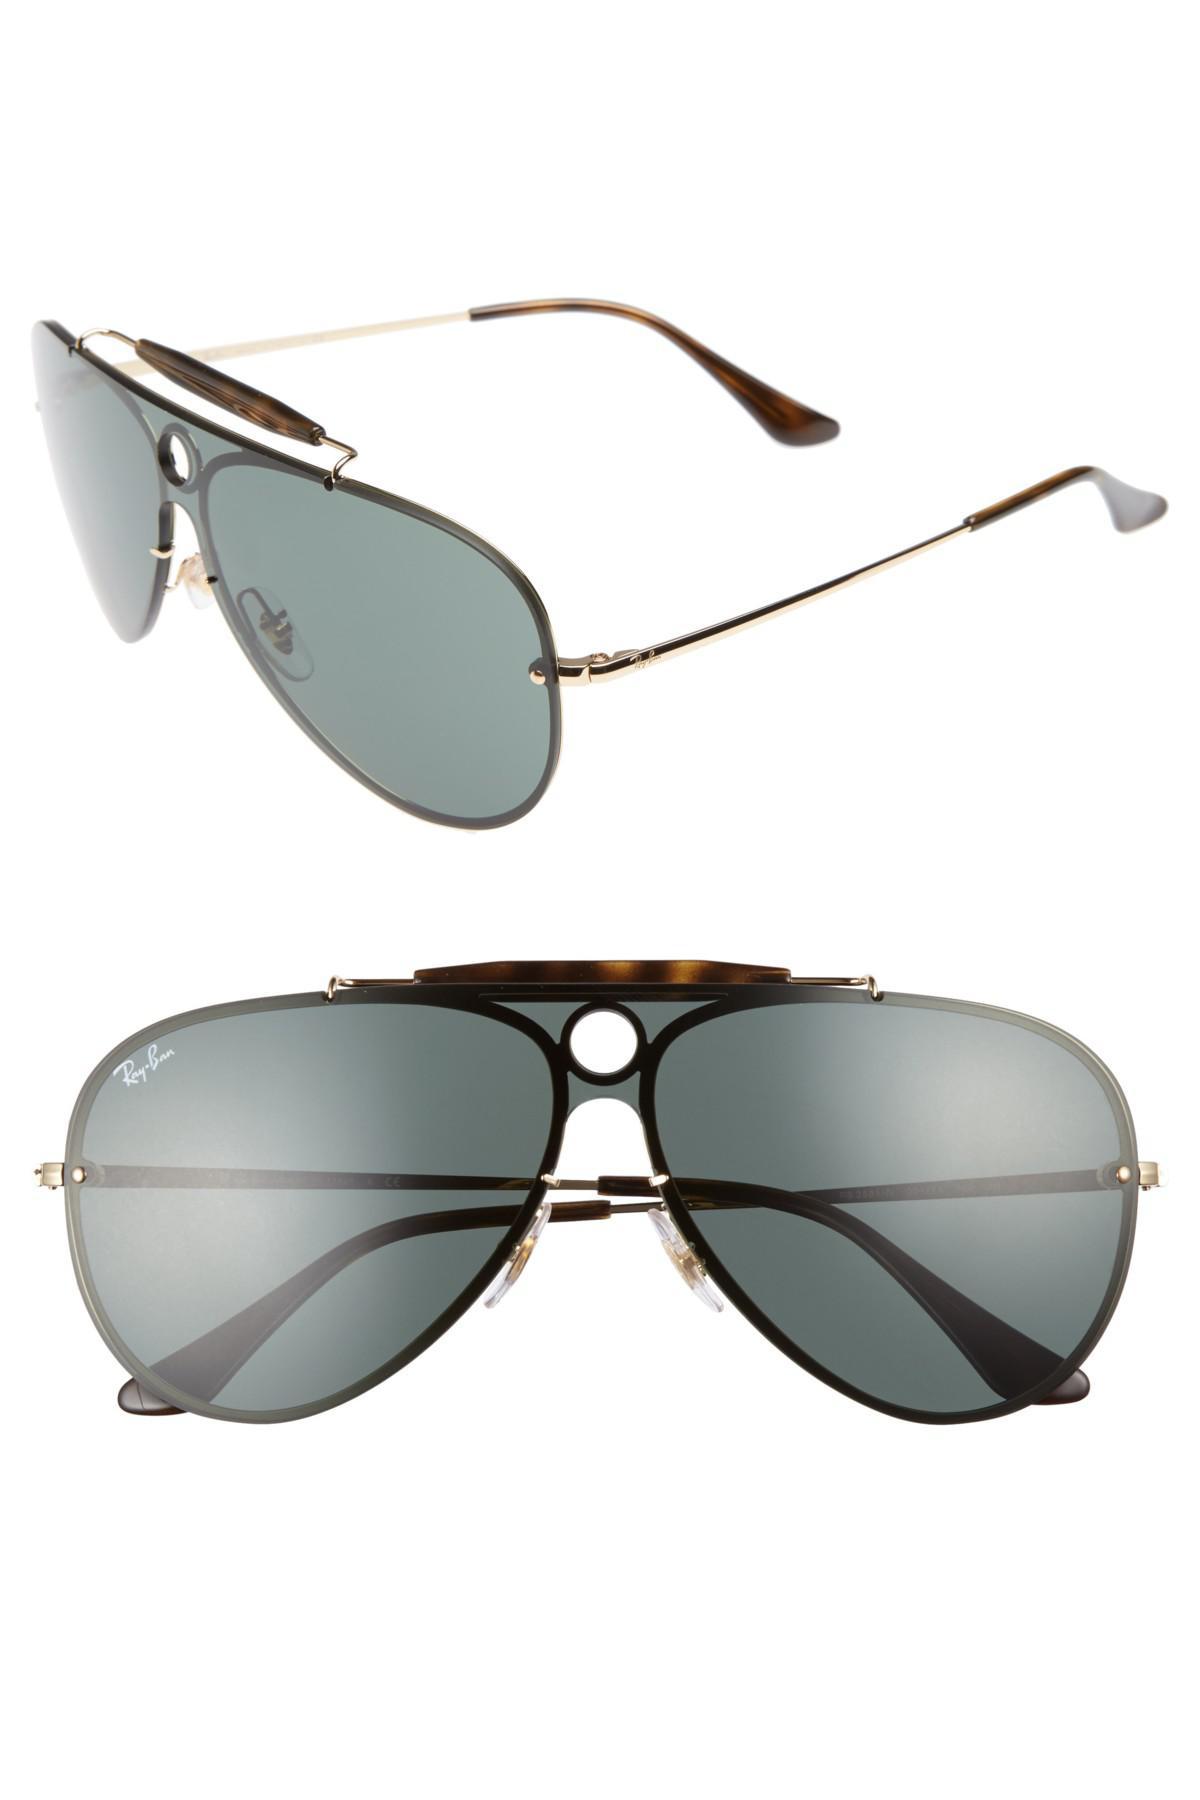 1927e26f2 Ray-Ban Blaze Shooter Shield Sunglasses in Metallic - Lyst